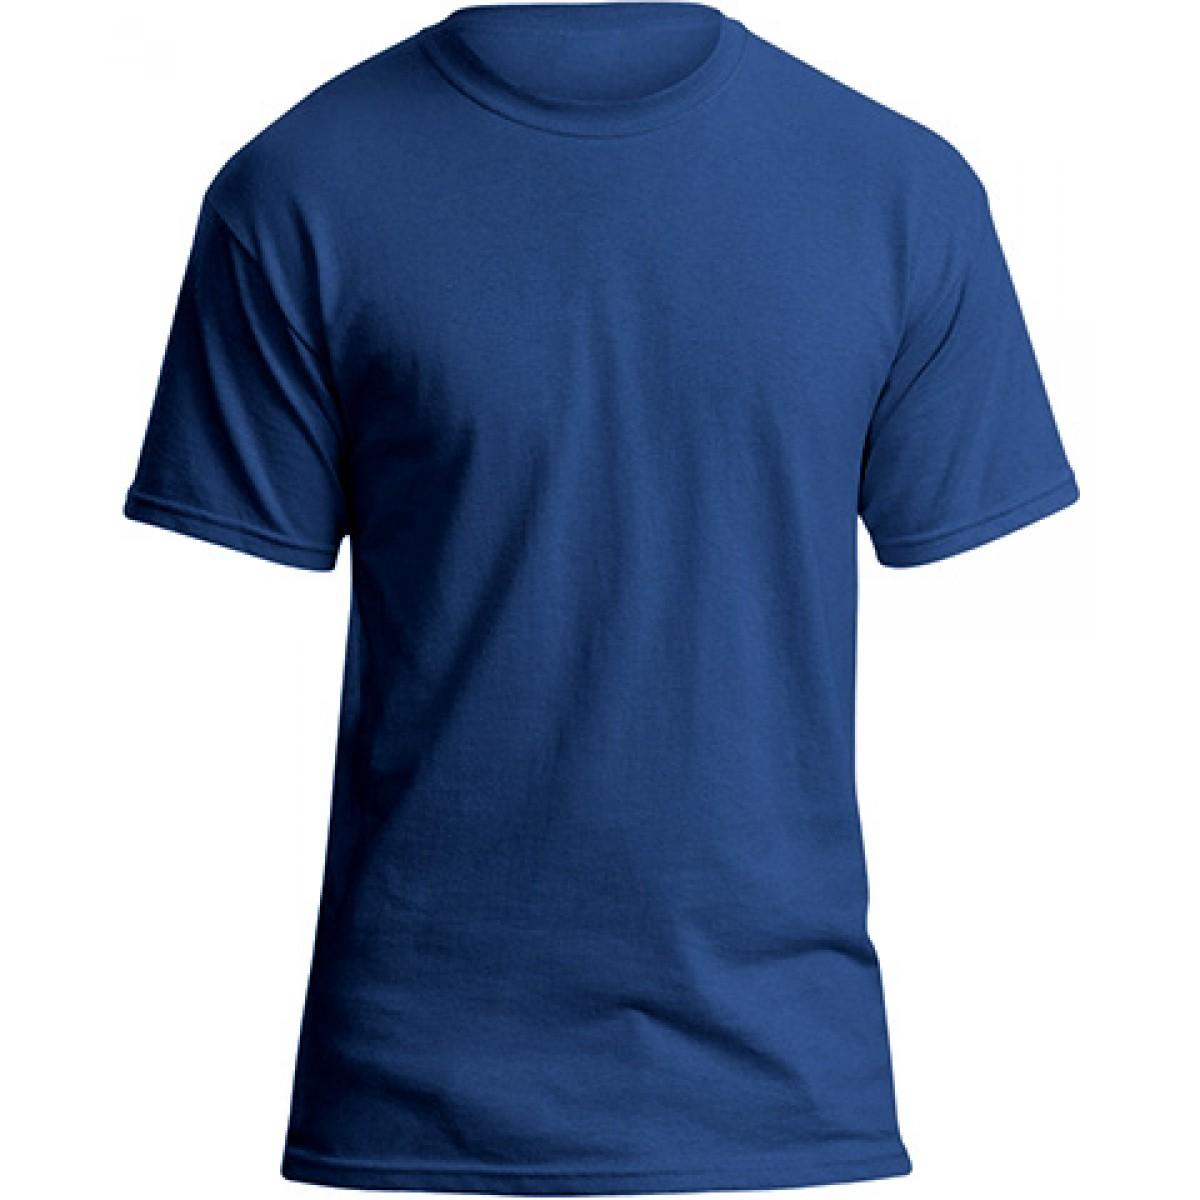 Soft 100% Cotton T-Shirt